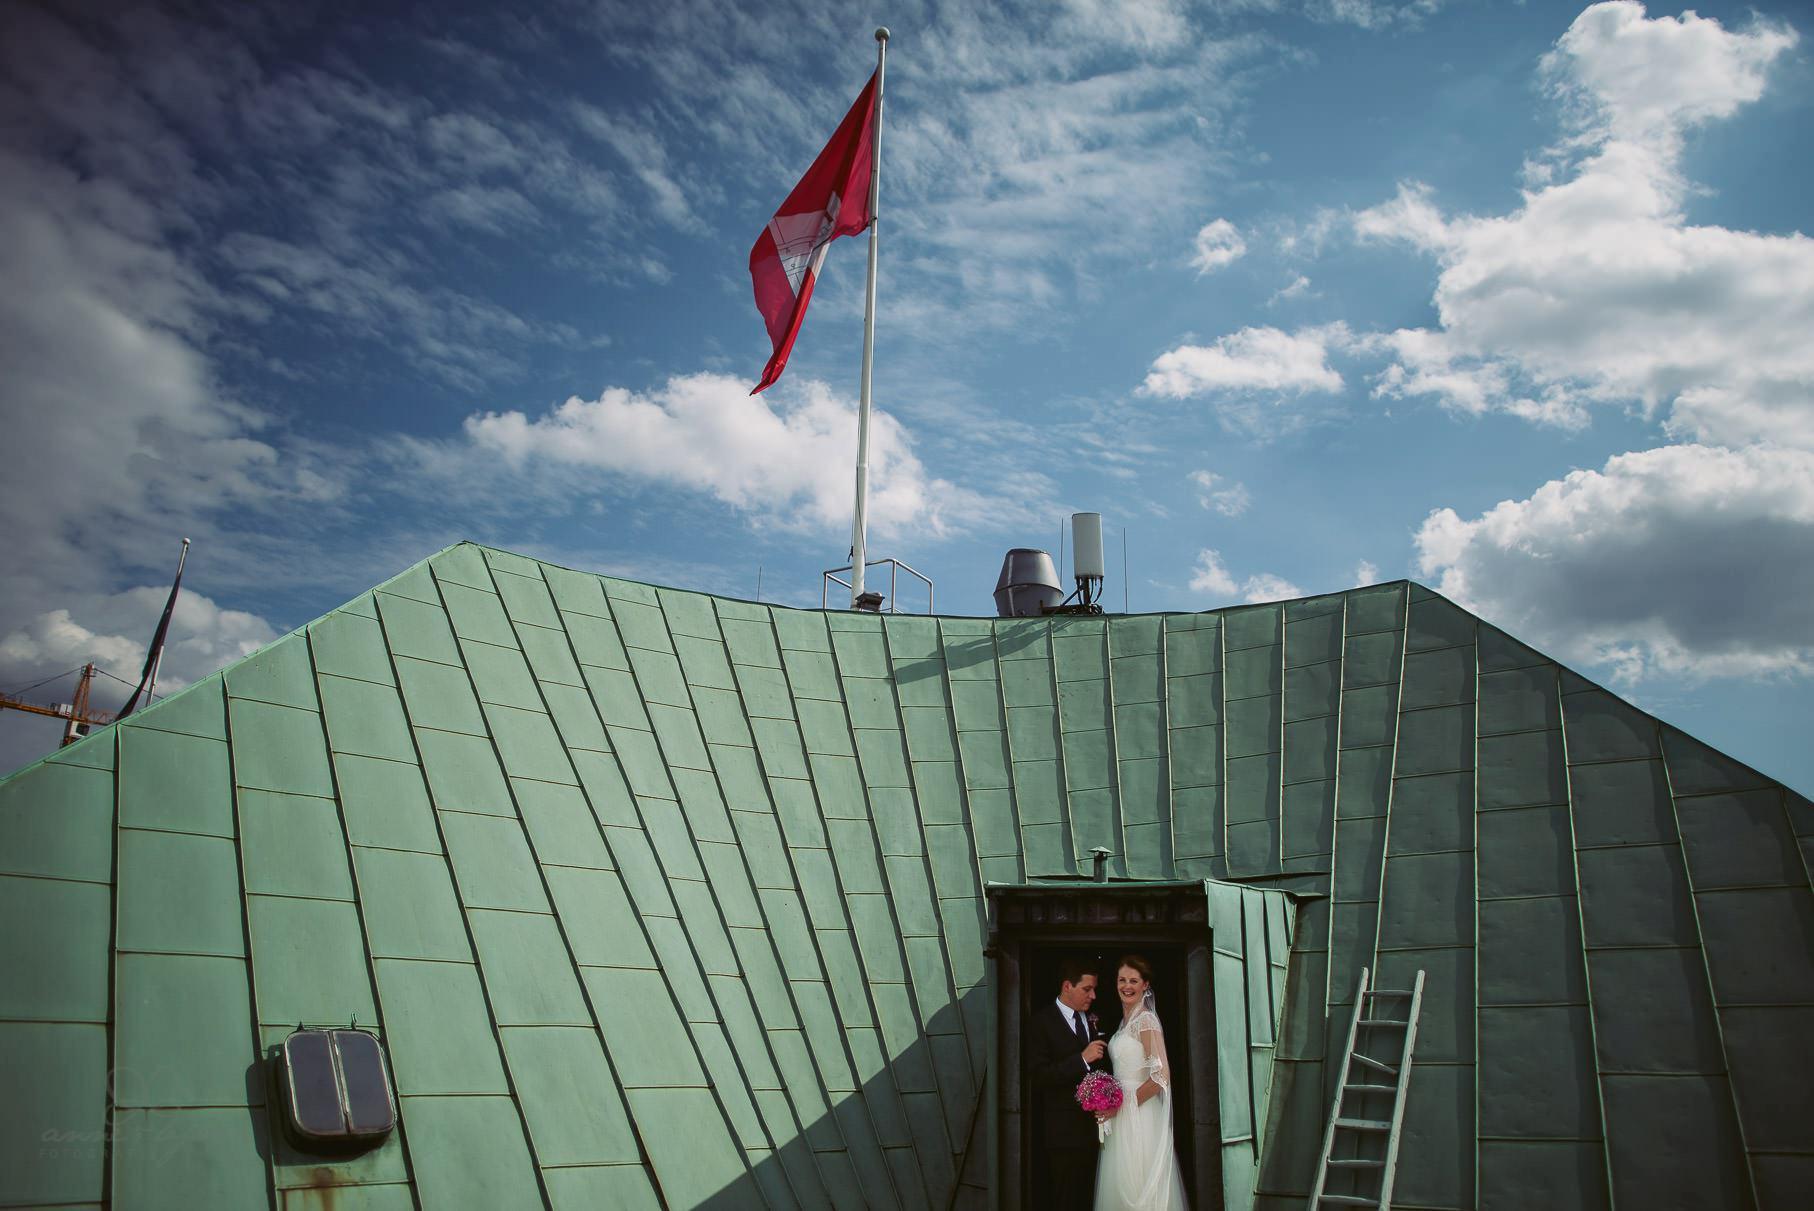 0027 aud blog 811 0003 - Hochzeit an der Hamburger Elbe - Ann-Katrin & Daniel